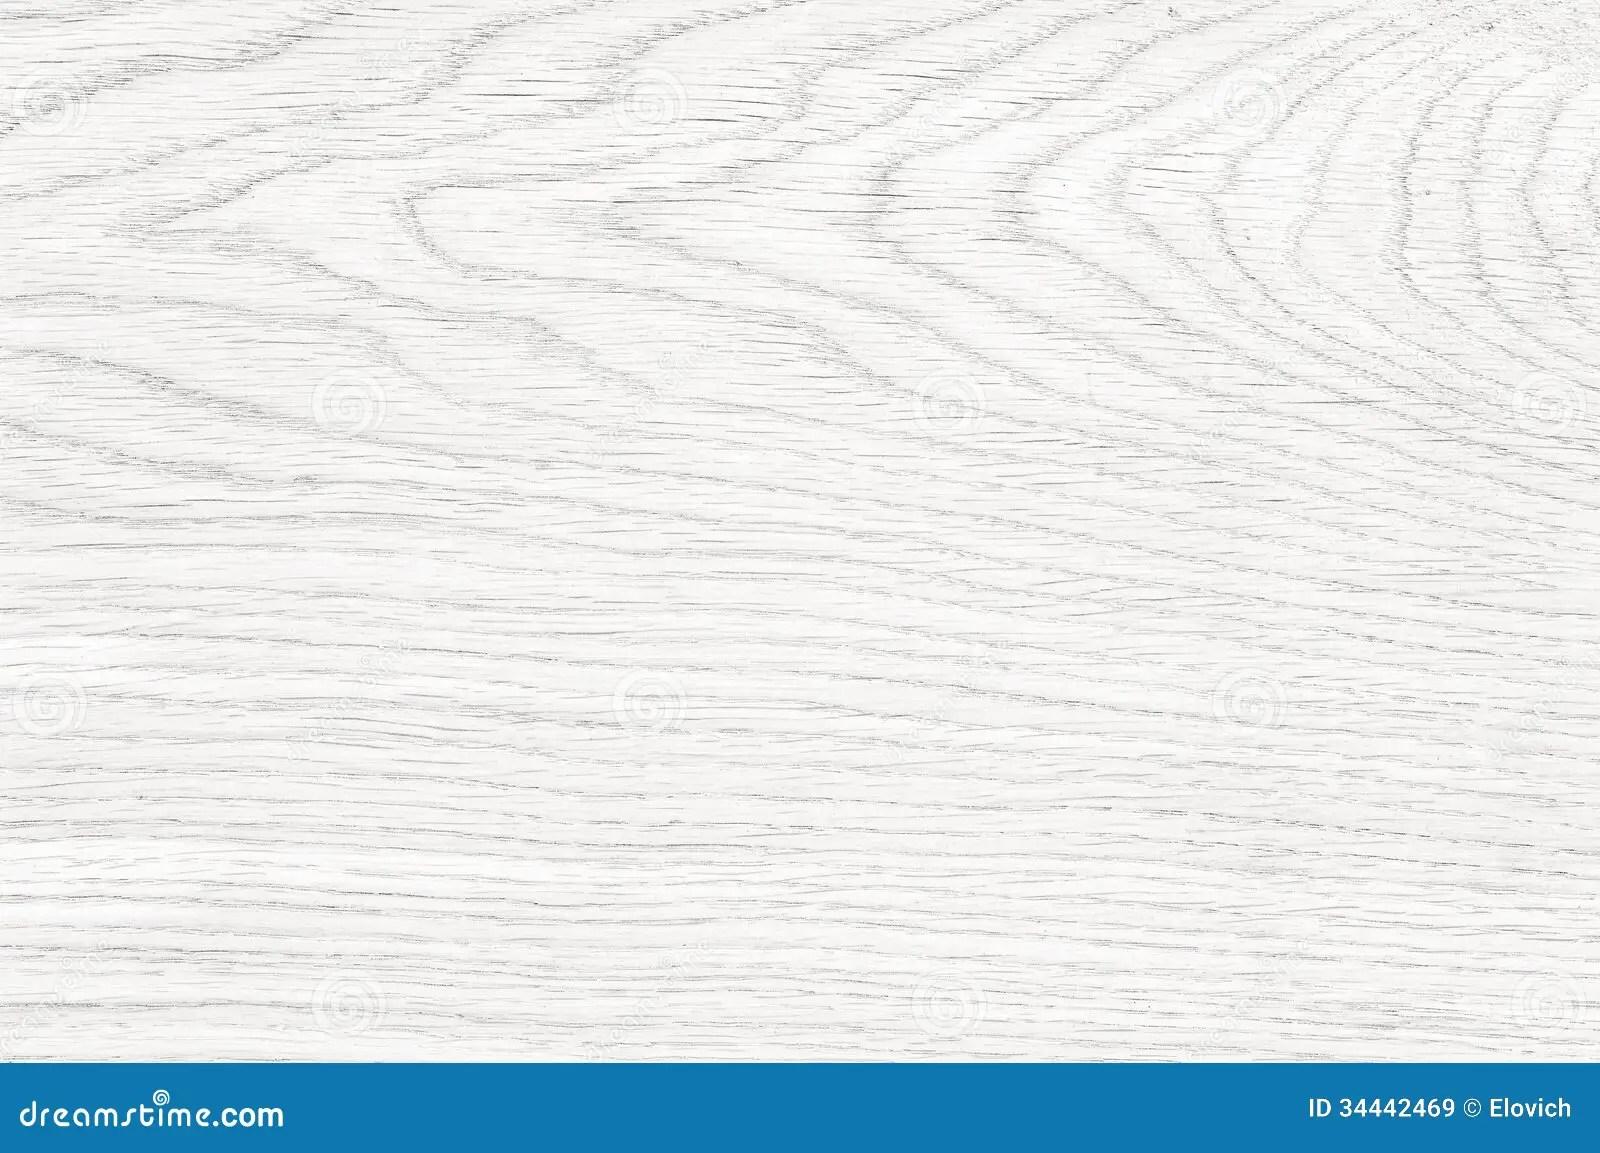 White Wood Texture Background Stock Image